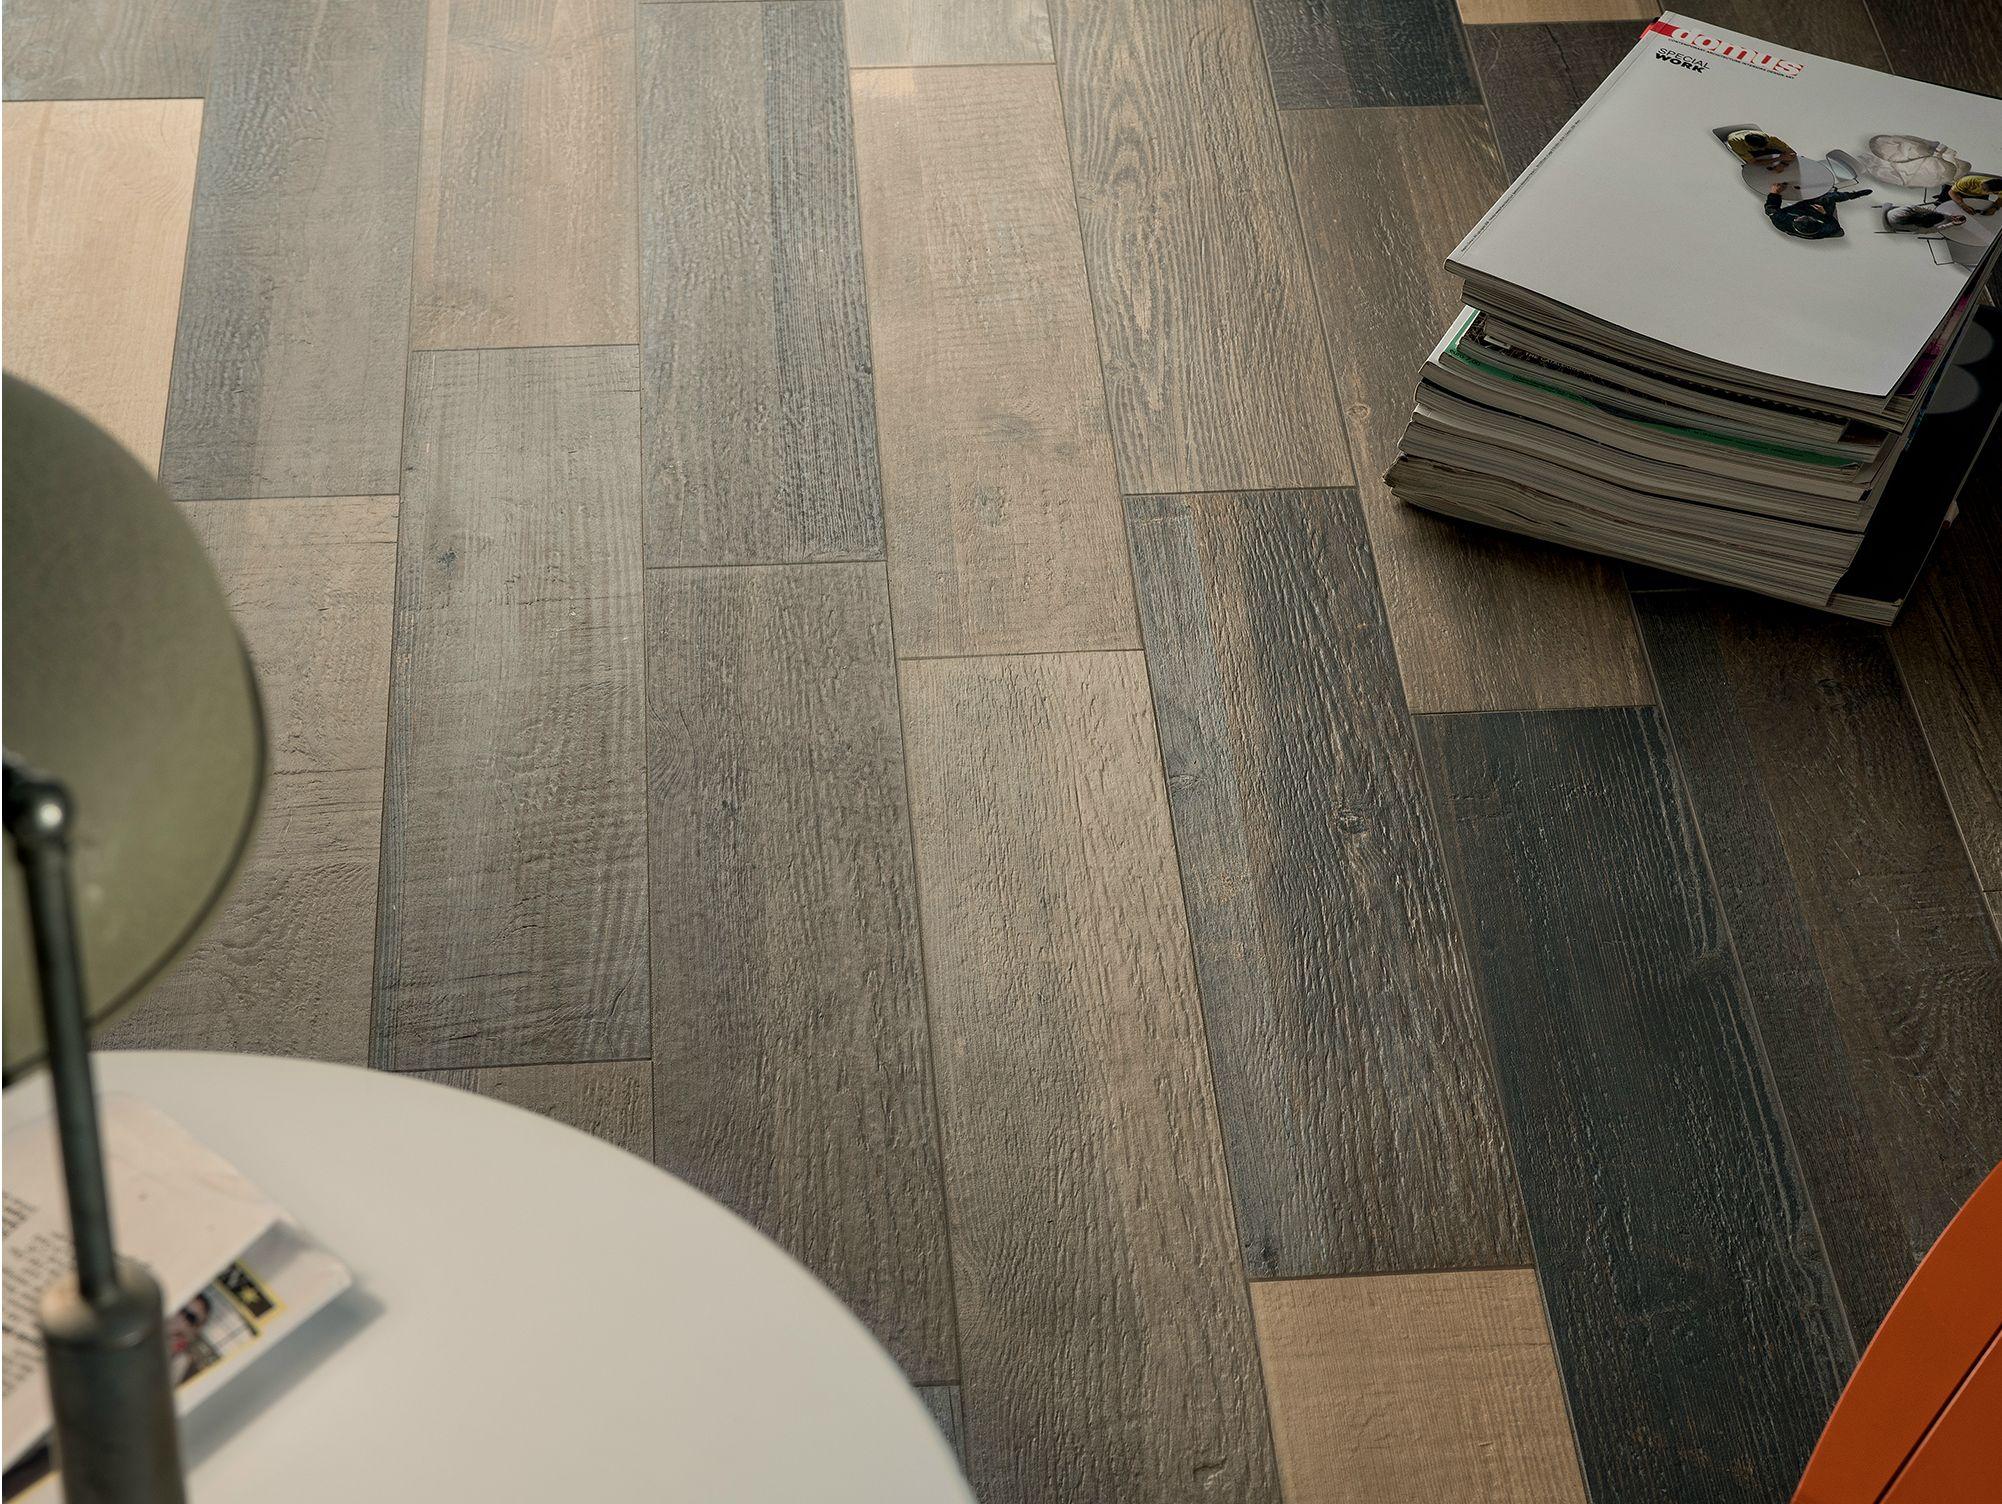 Cottage wood pavimento imitaci n madera by ceramica fioranese - Gres porcelanico imitacion madera ...